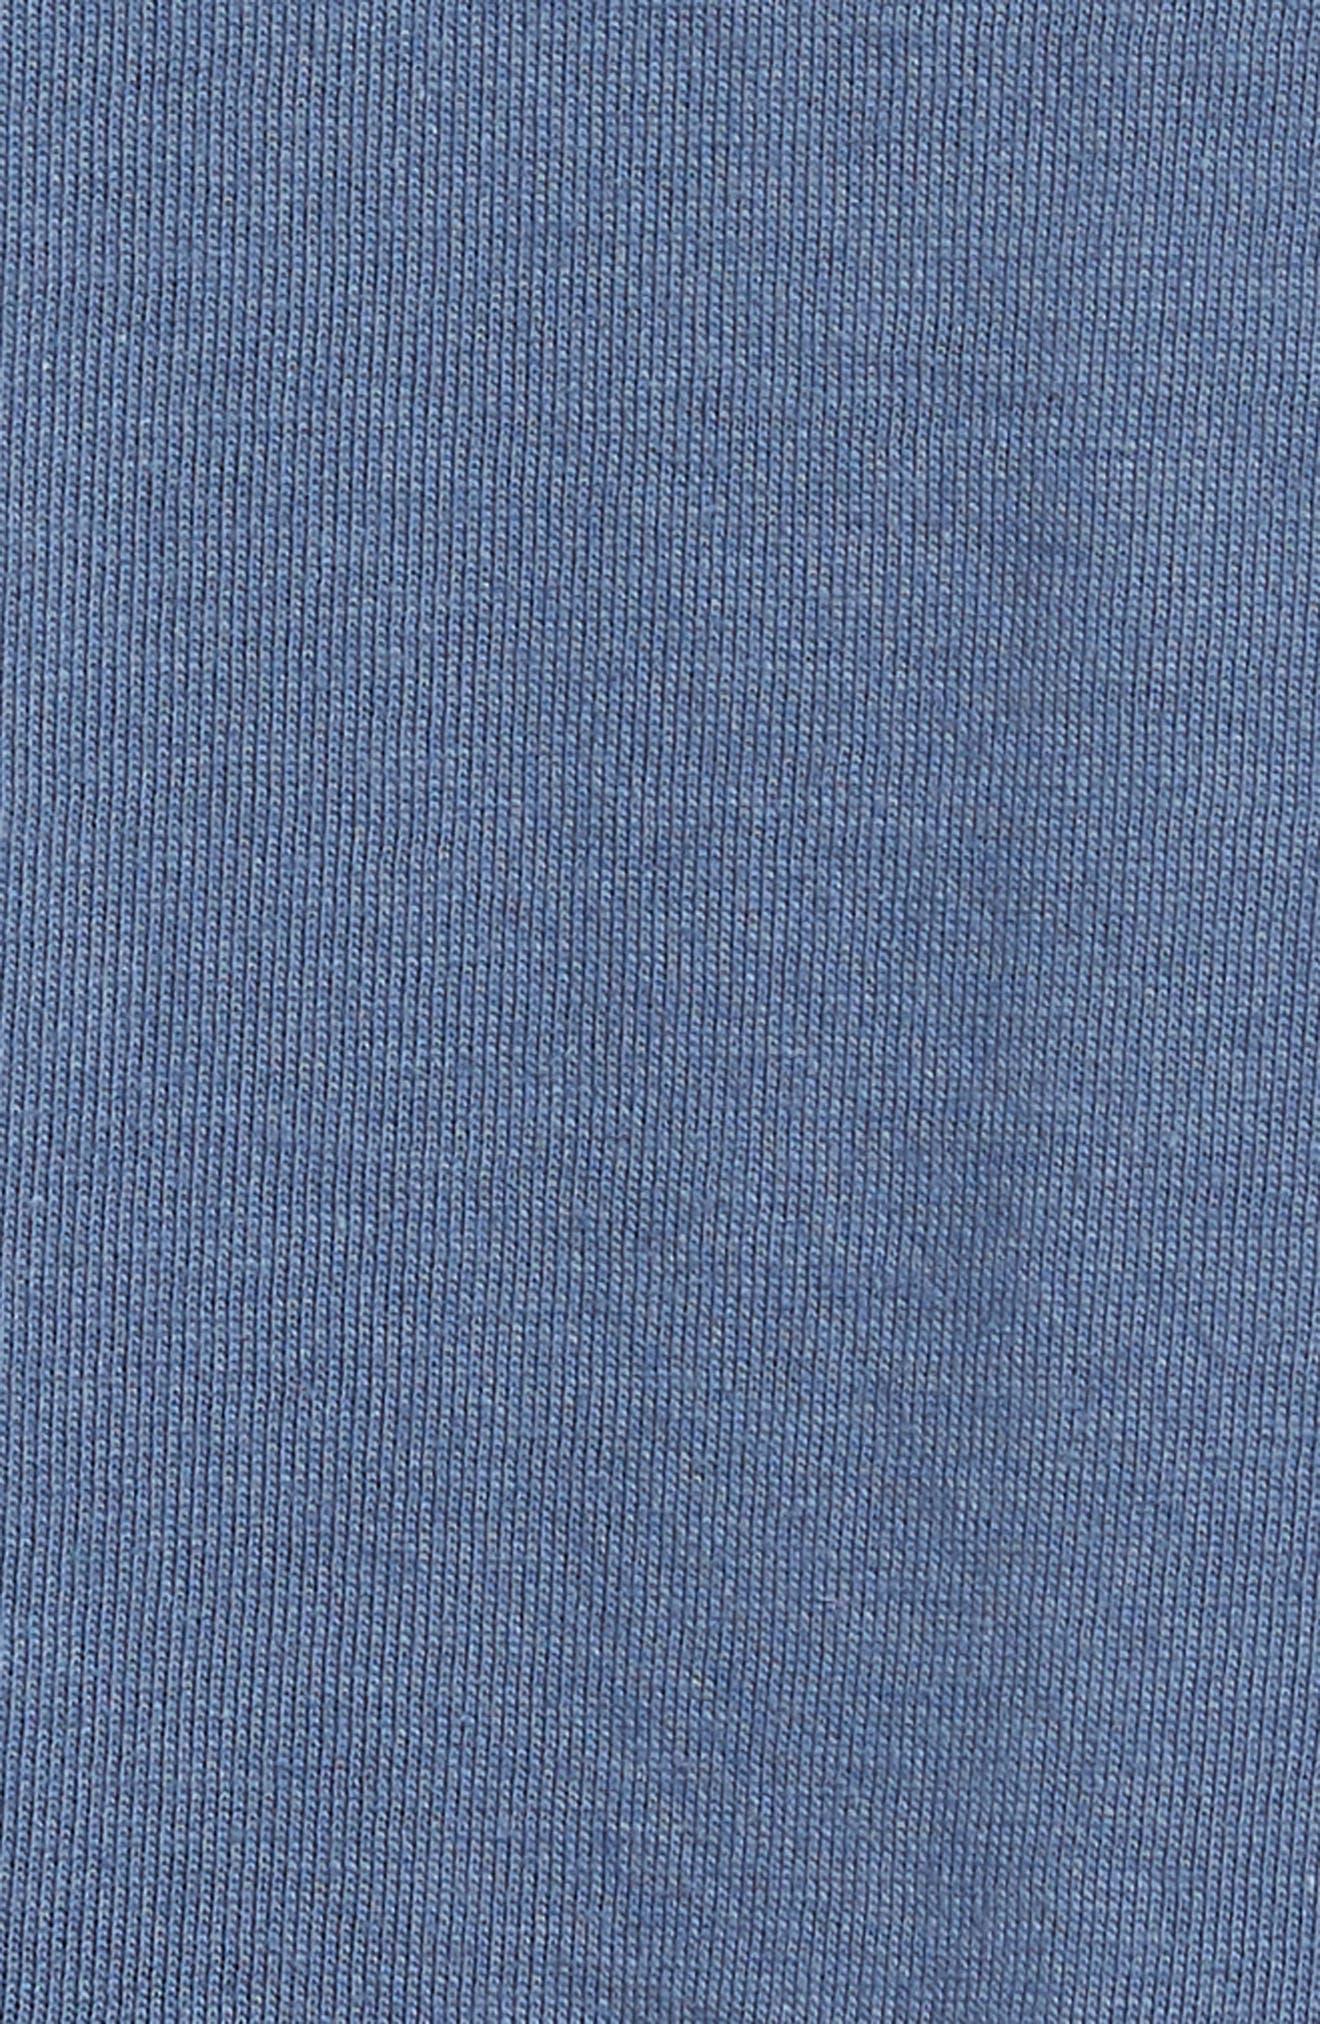 Burch Eye Graphic T-Shirt,                             Alternate thumbnail 5, color,                             Deep Blue